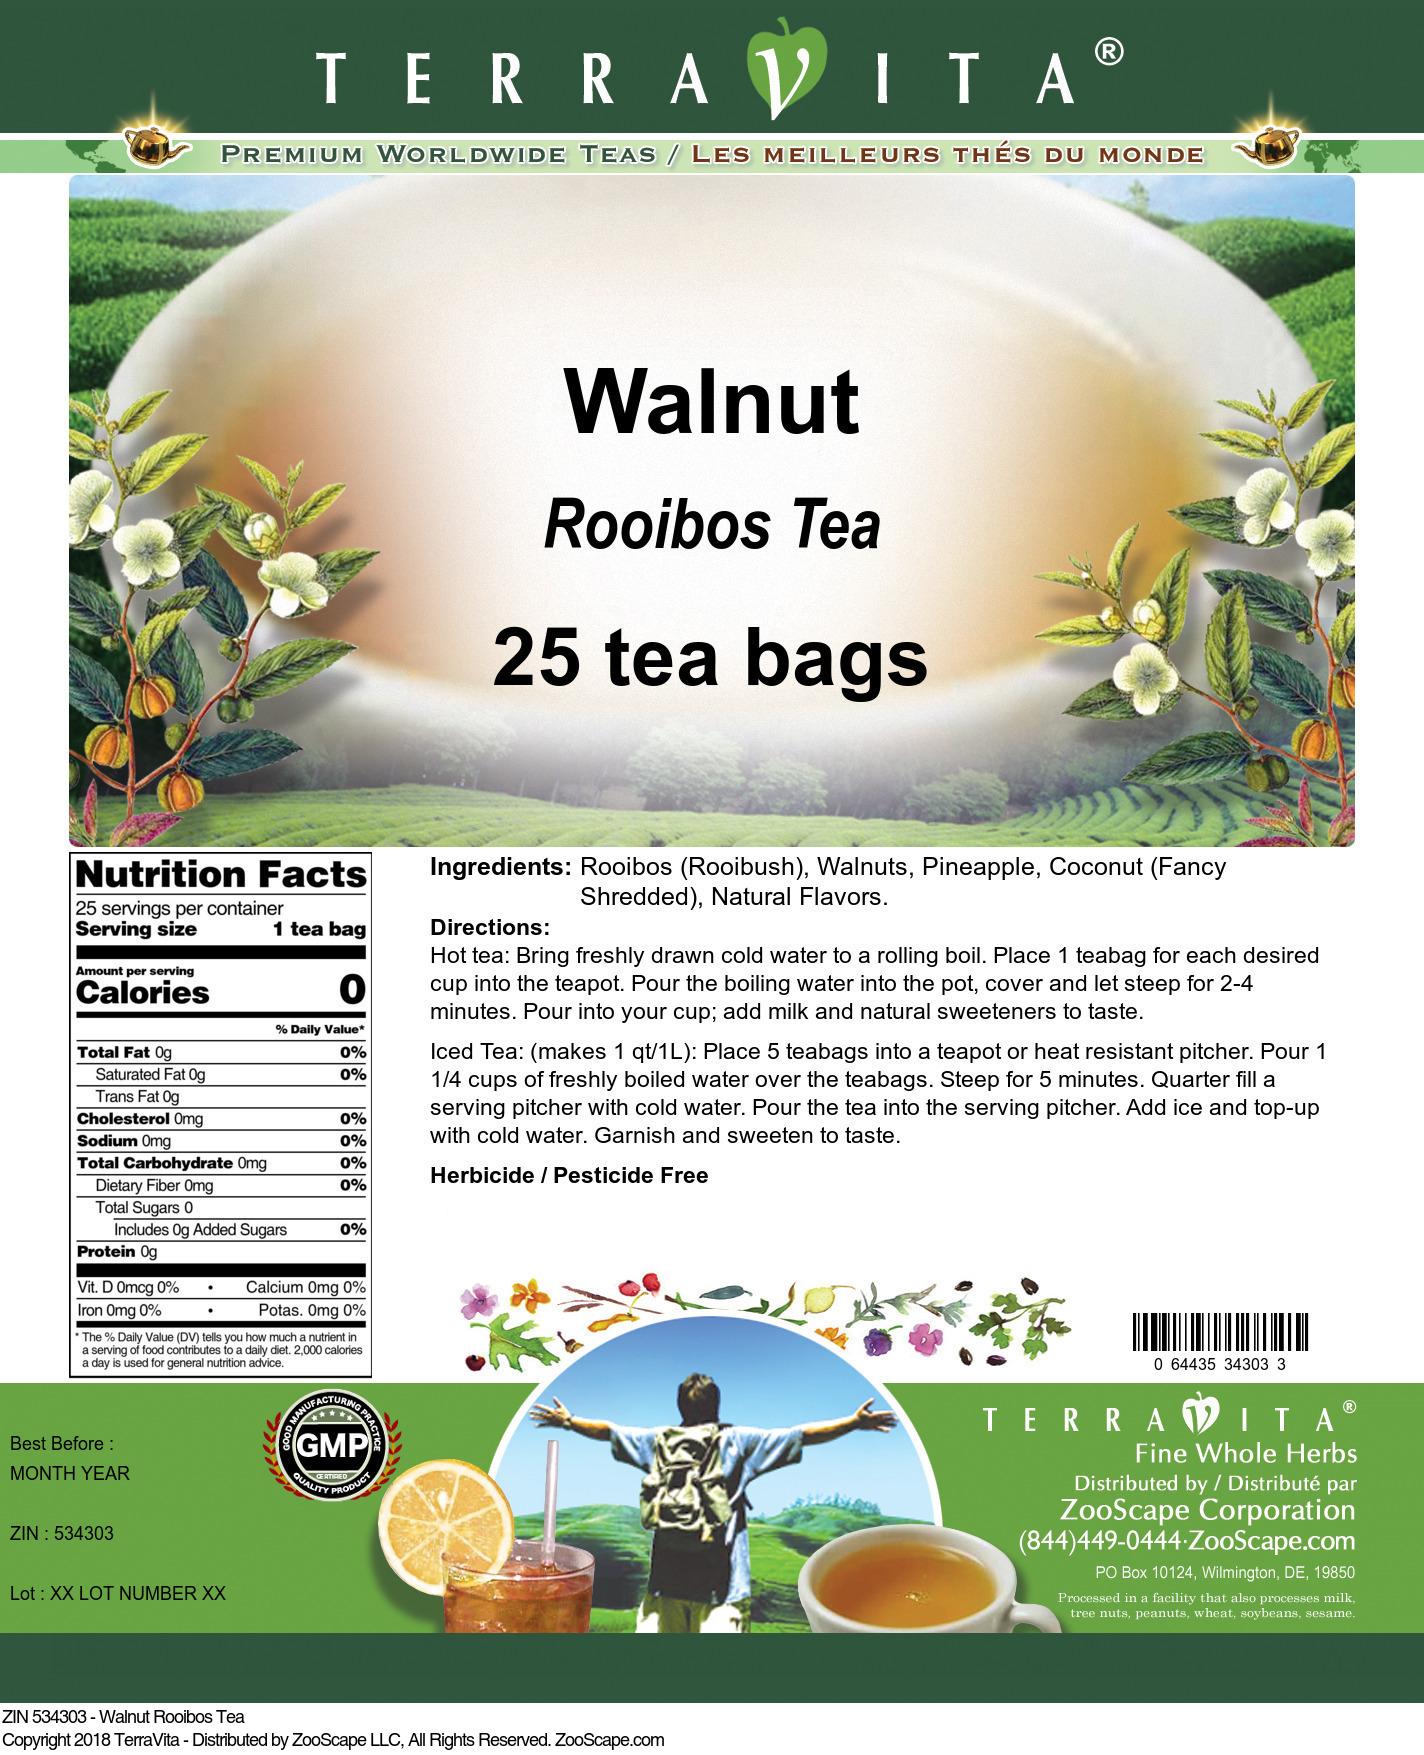 Walnut Rooibos Tea